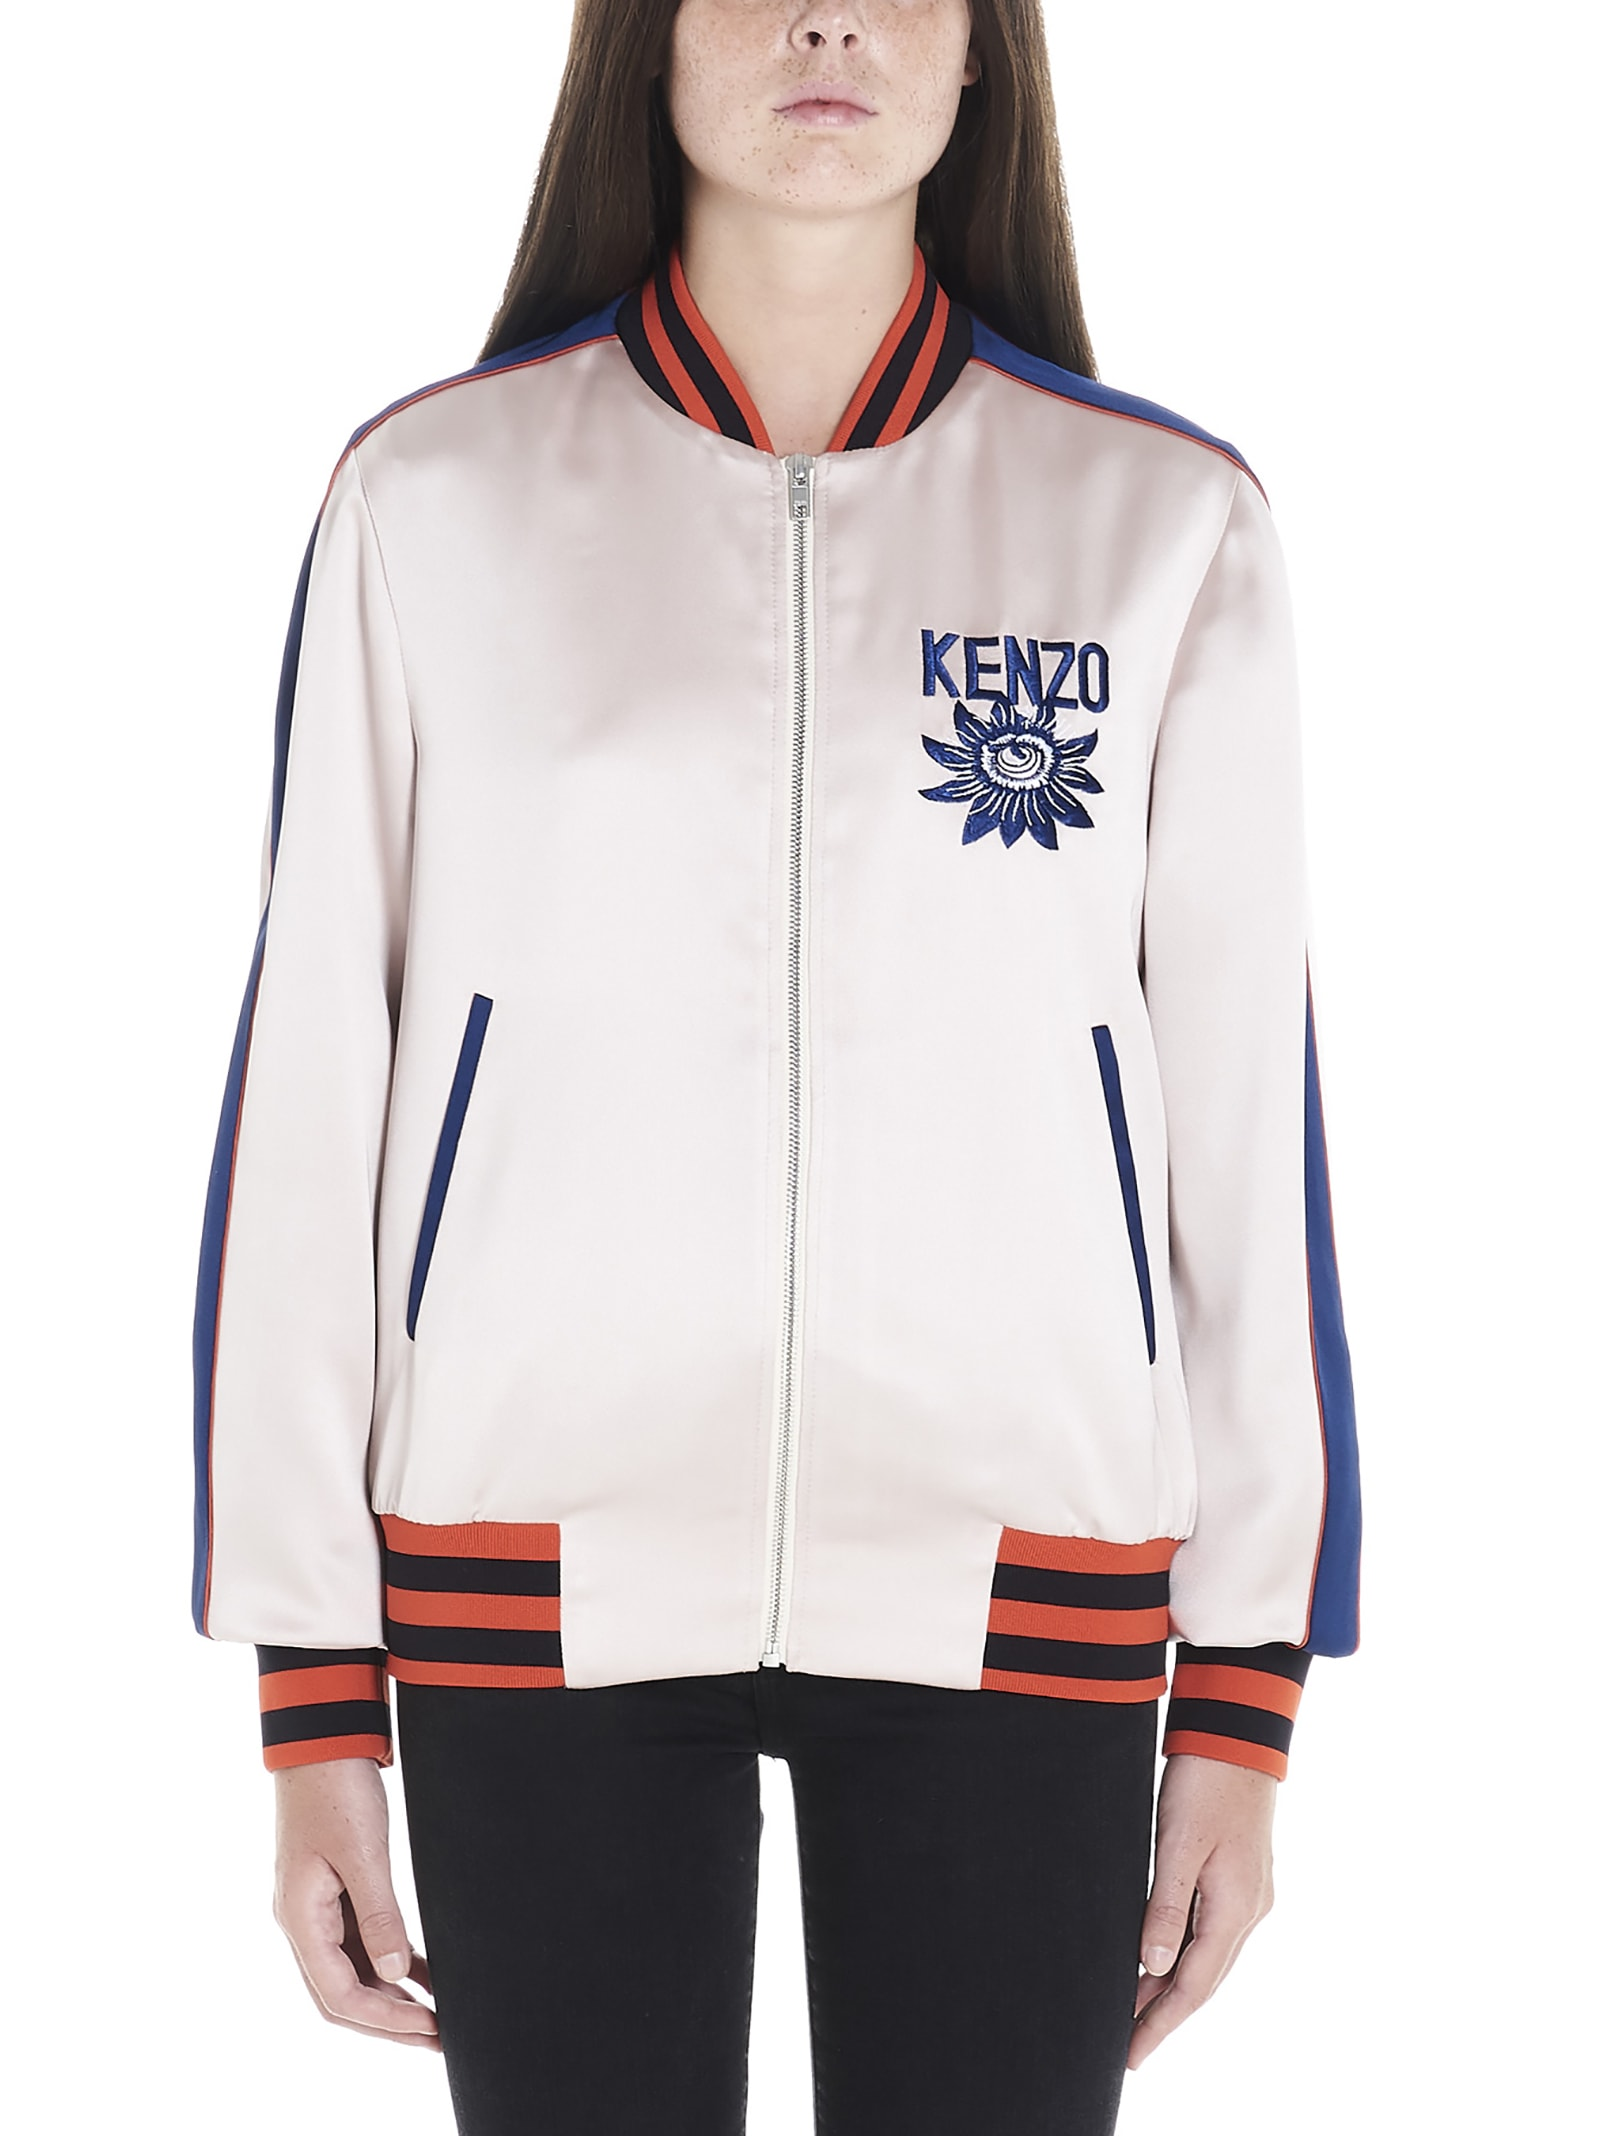 Kenzo souvenir Jacket